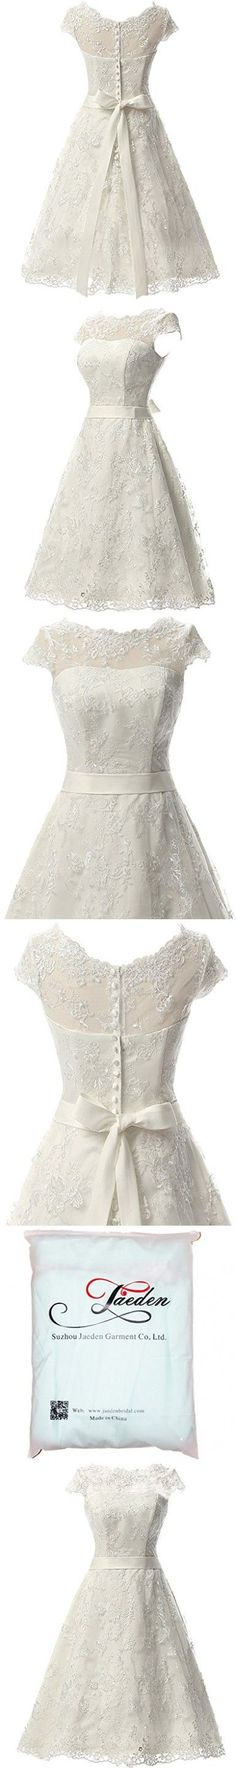 JAEDEN Women's Vintage Lace Wedding Dress Short Bridal Gown Dresses with Sash Ivory US24W